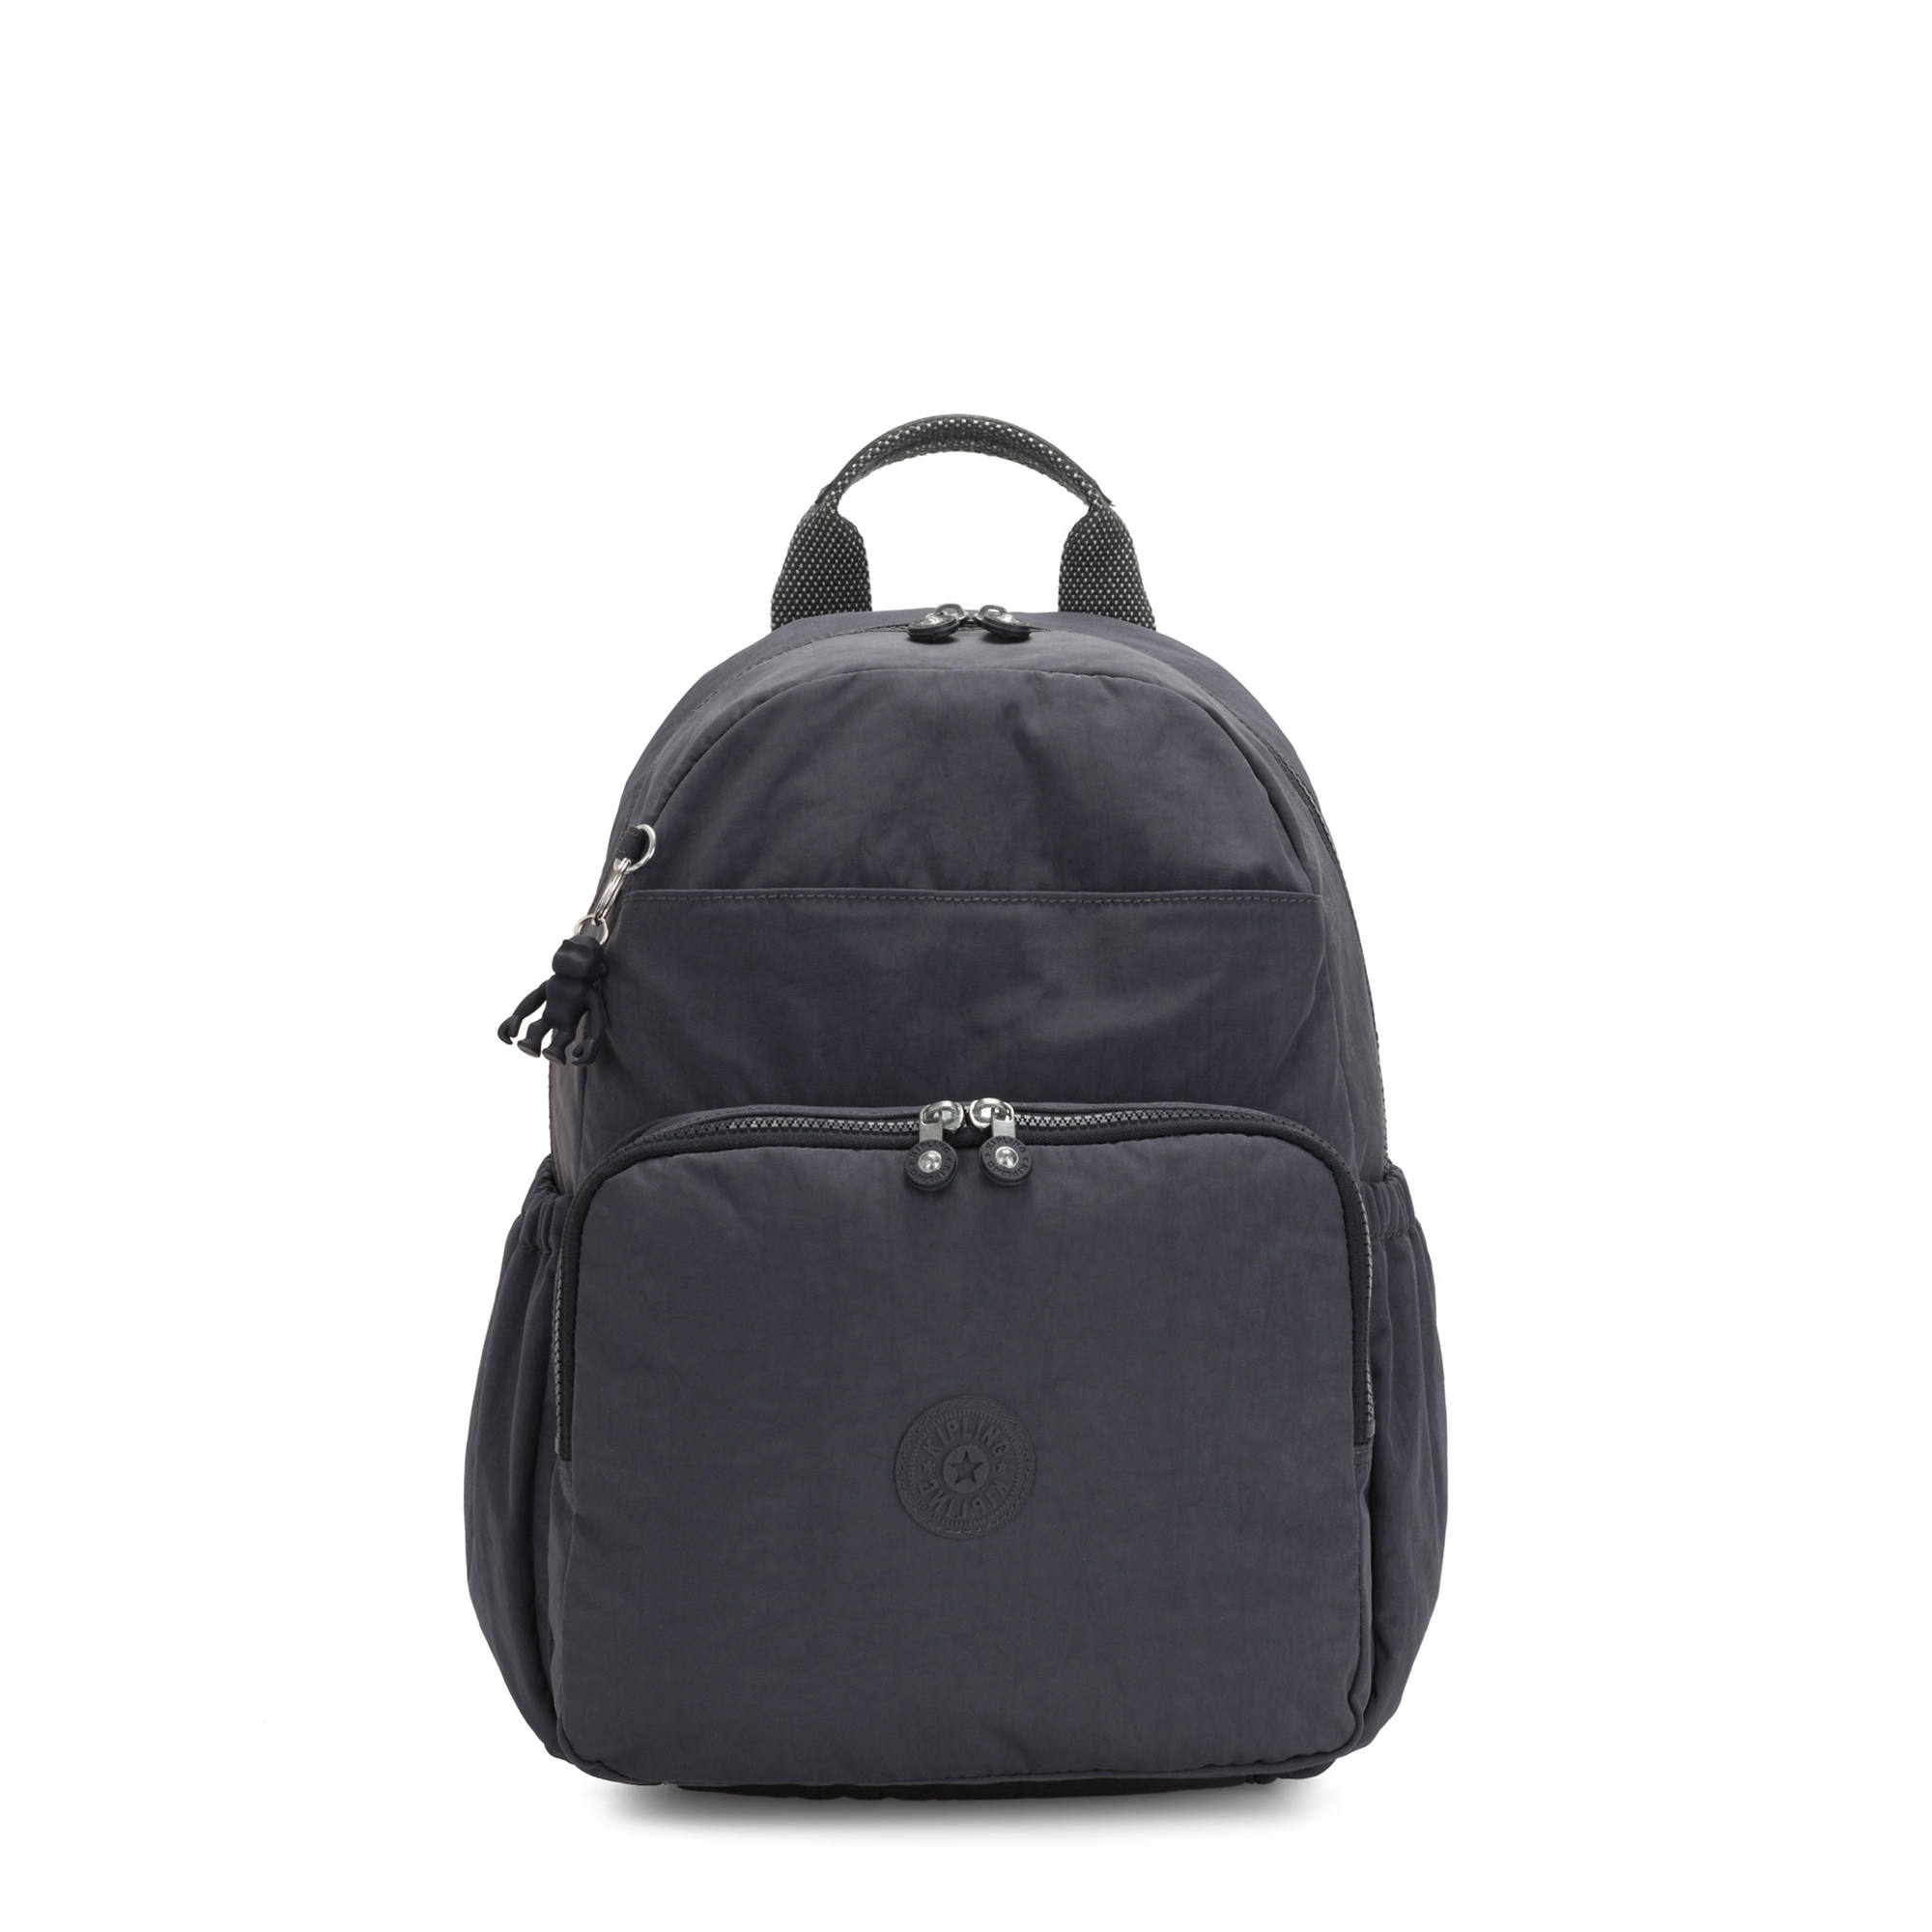 Kipling Maisie Metallic Diaper Backpack